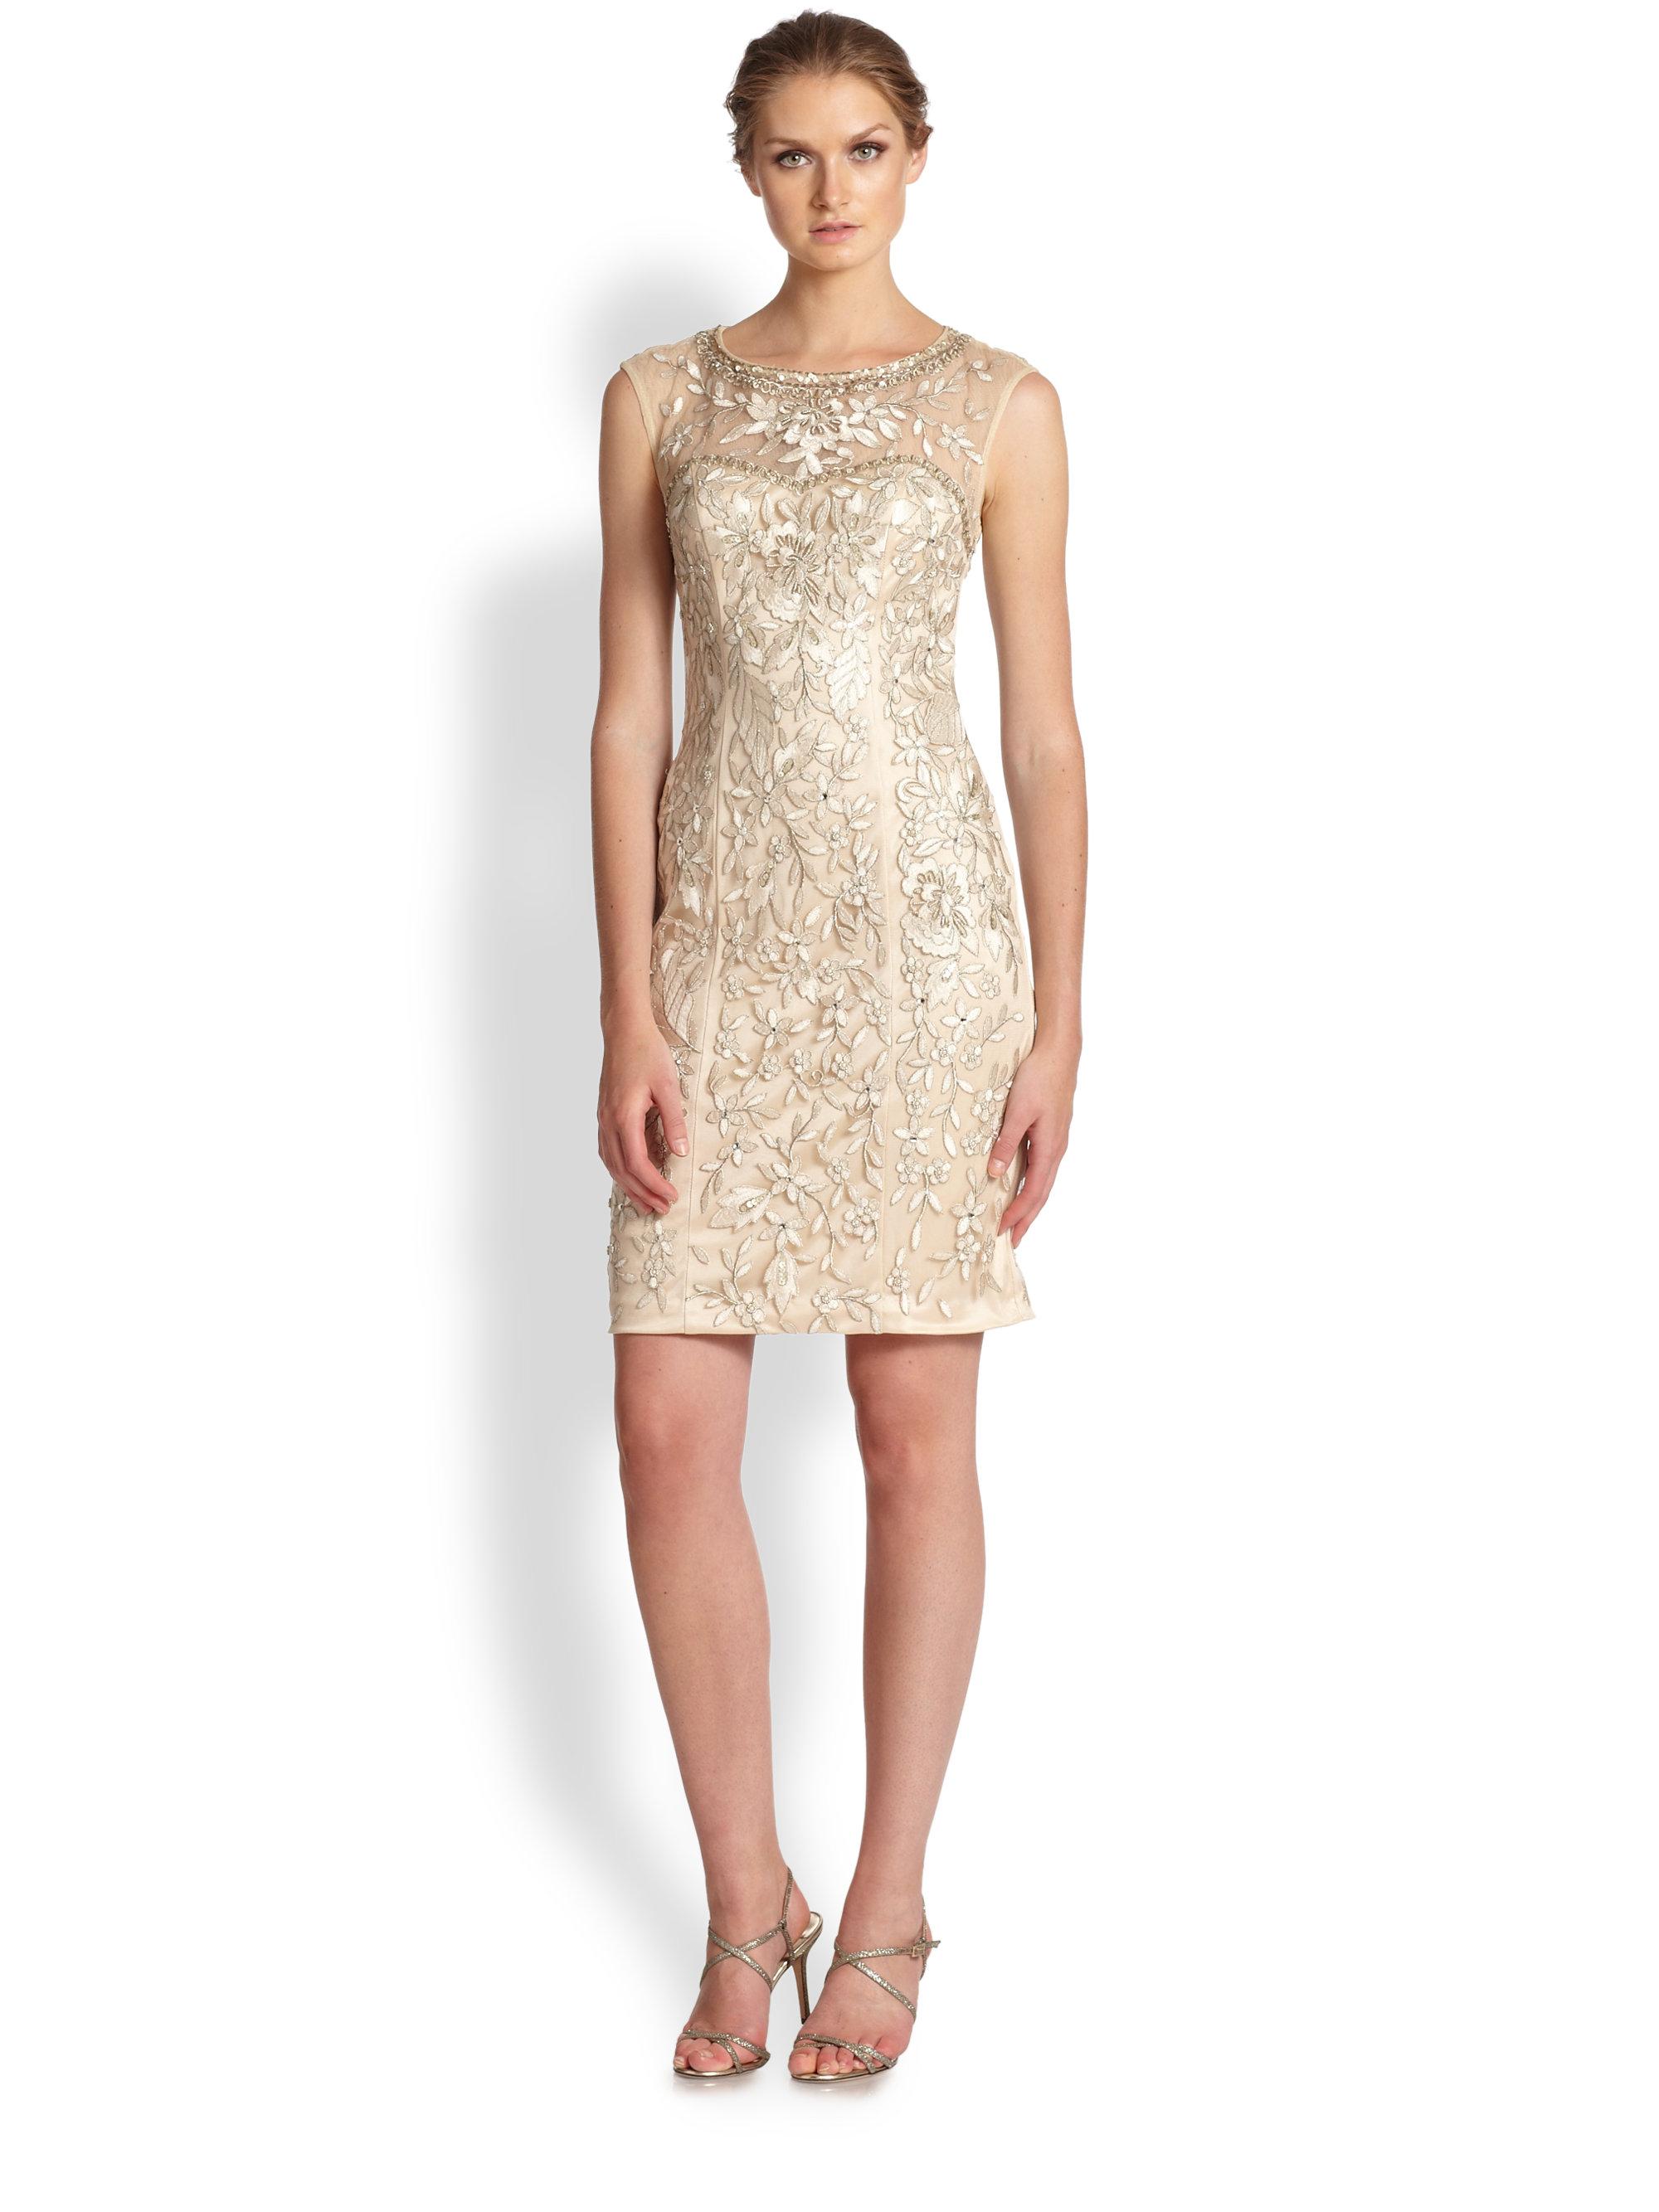 Sue wong Embellished Illusion Sheath Dress in Metallic | Lyst